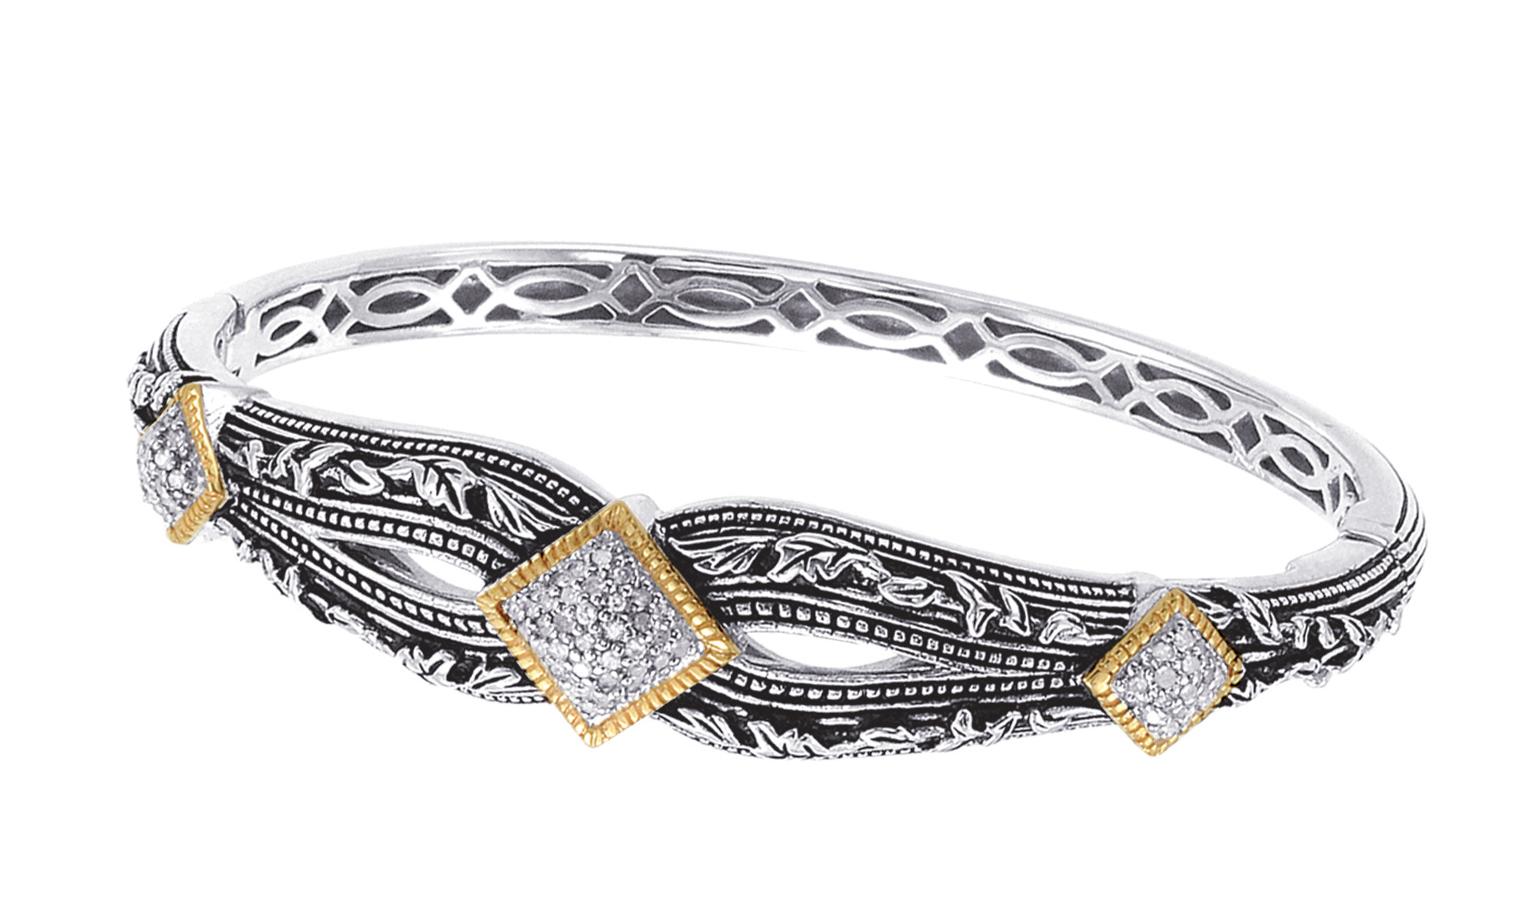 Alesandro Menegati 18K Accented Sterling Silver Bangle with Diamonds. Price: $627.00